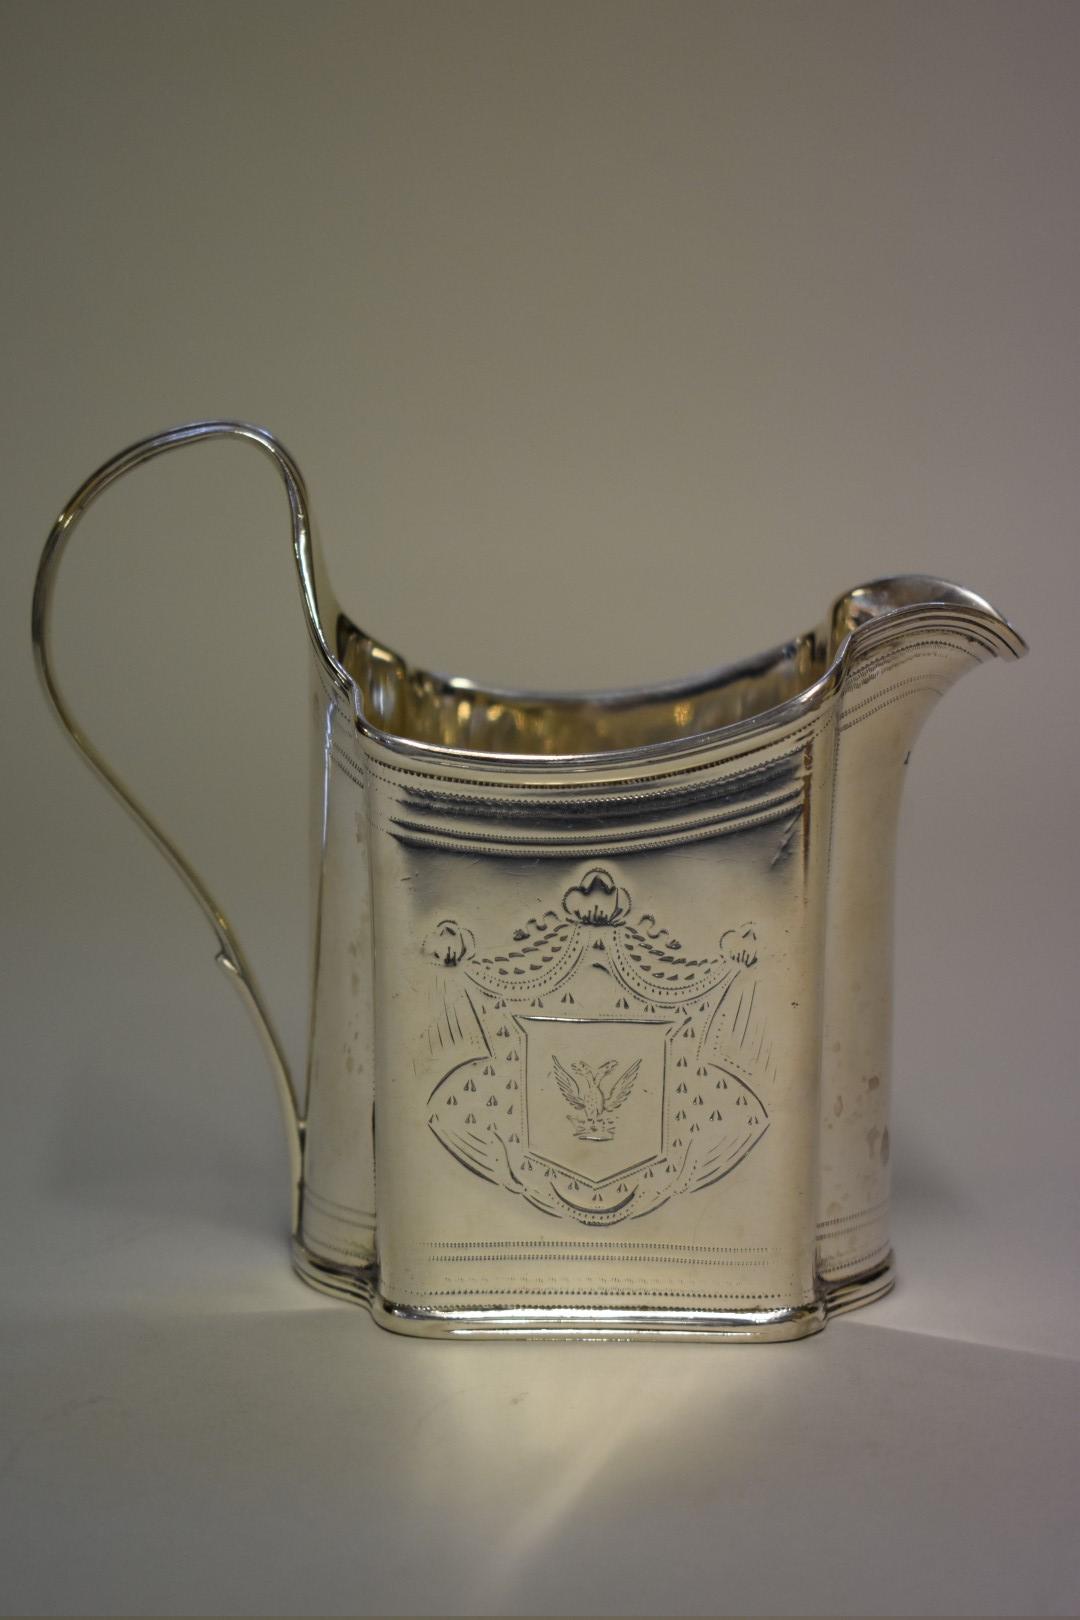 Lot 9 - A George III silver milk jug,makers mark indistinct, London 1793, 11.5cm high, 168g.